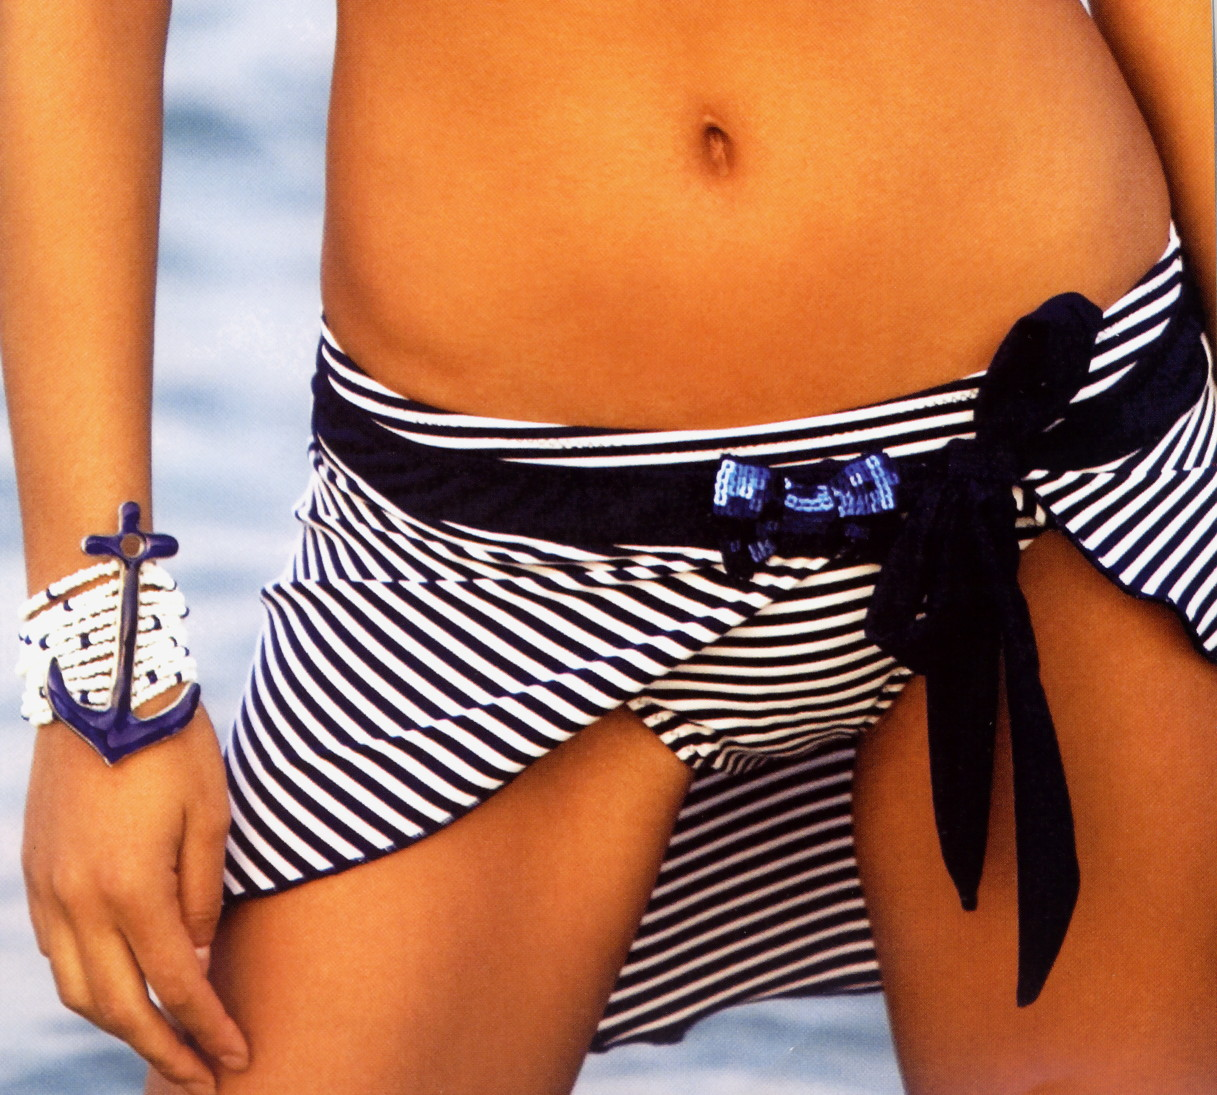 Dámský plážový šátek - pareo Lormar Surf